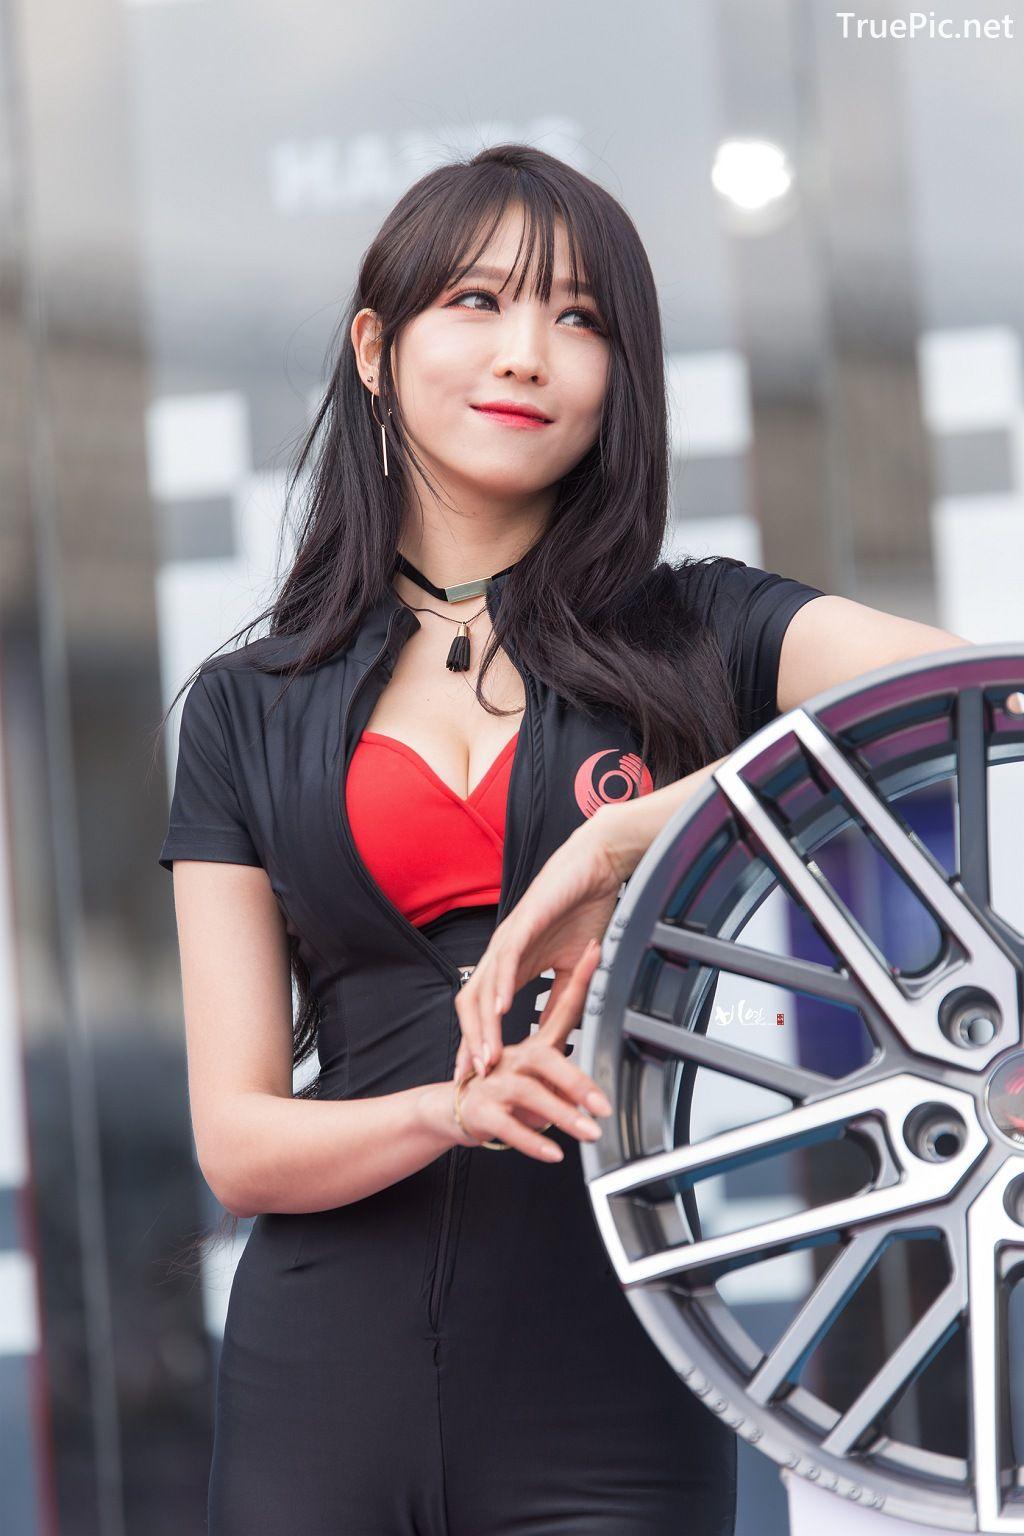 Image-Korean-Racing-Model-Lee-Eun-Hye-At-Incheon-Korea-Tuning-Festival-TruePic.net- Picture-8